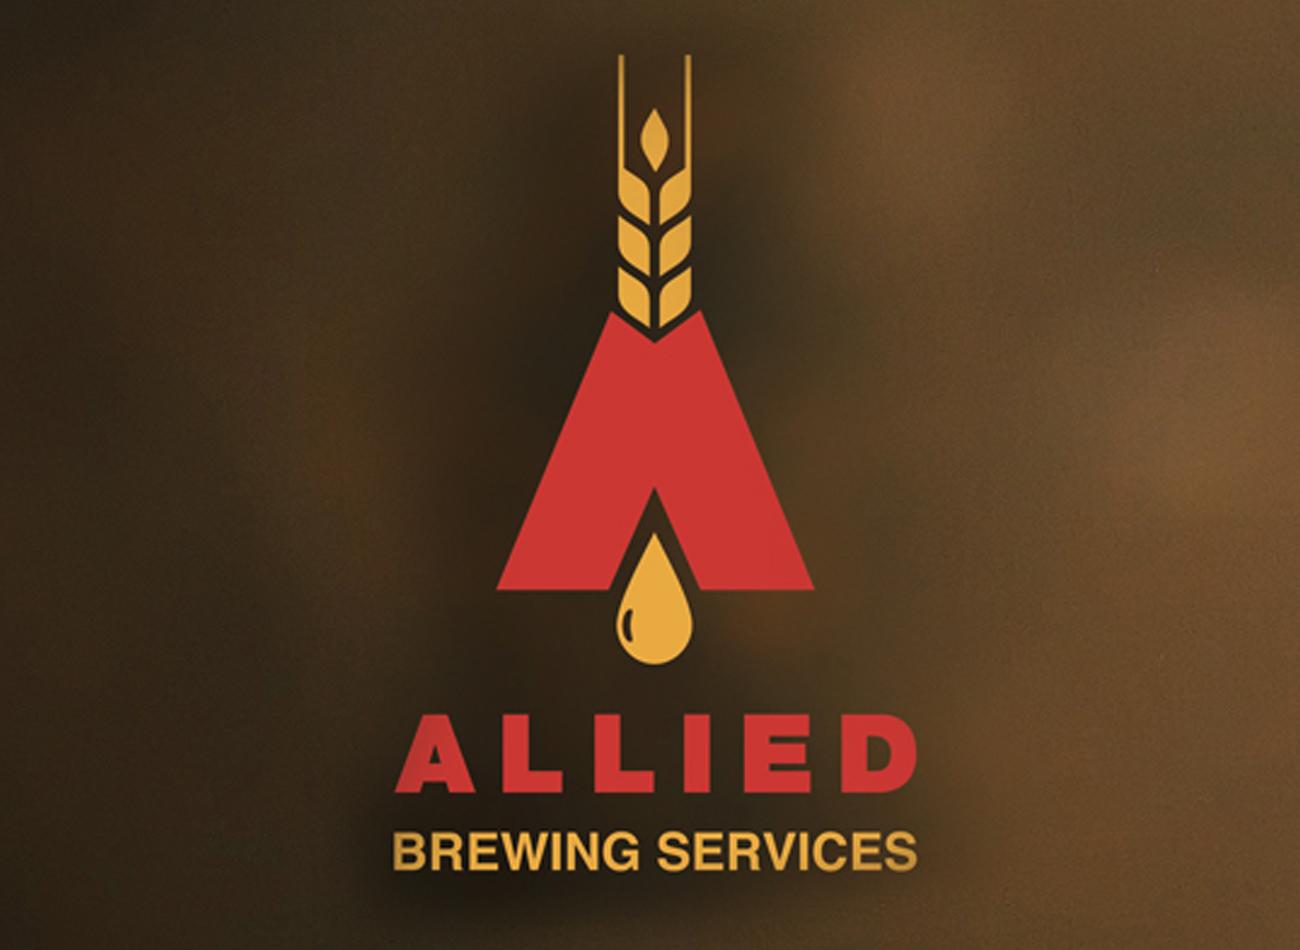 allied-brewing-graphic-Corporate-Identity-Agent-Orange-Design-Thumbnail.jpg